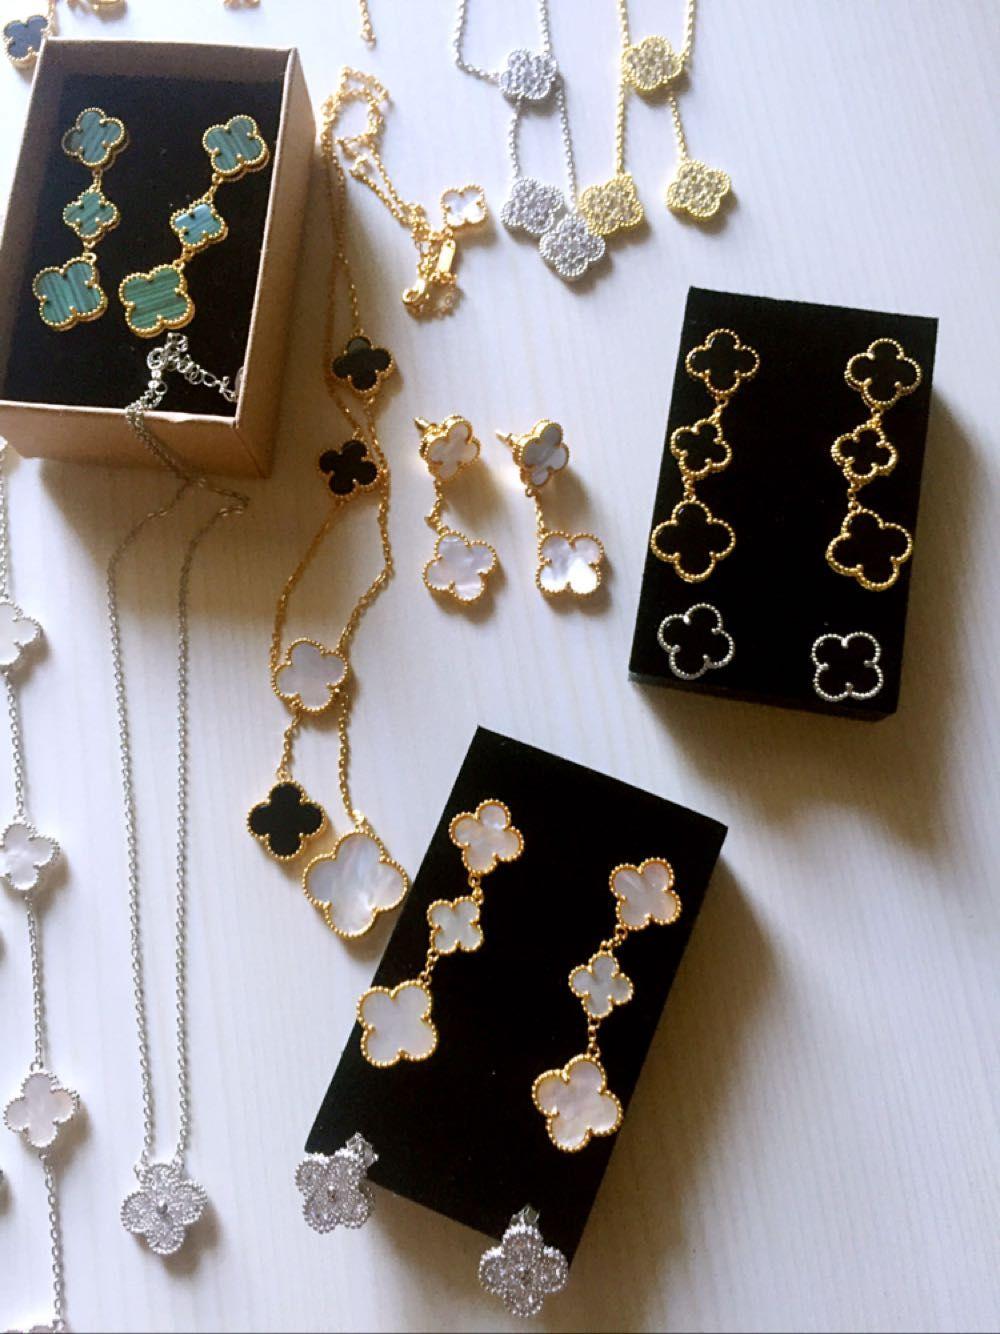 25+ Four leaf clover jewelry brand ideas in 2021